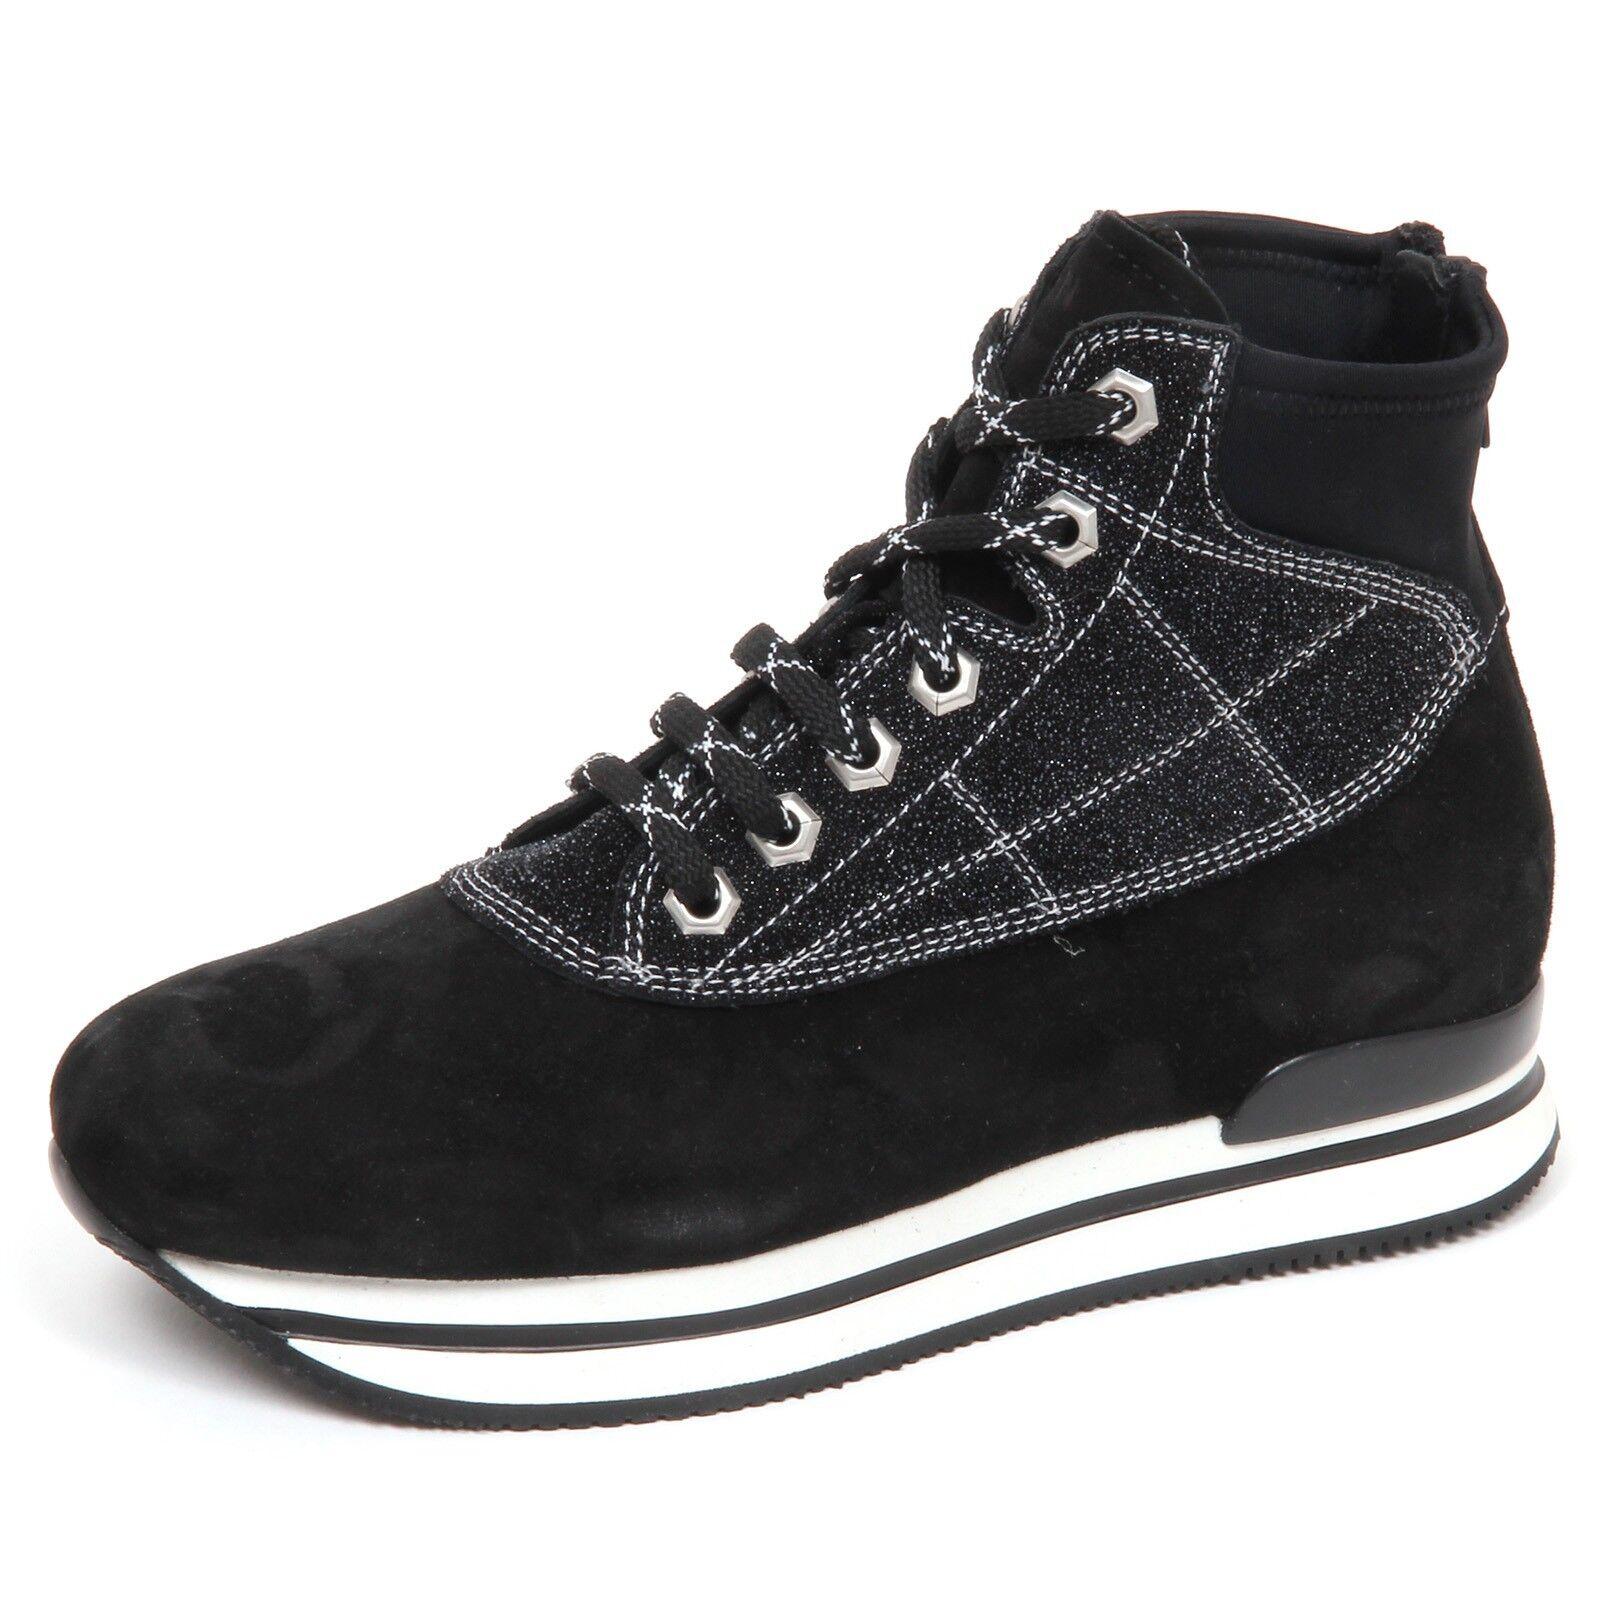 E4790 Sneaker women black Hogan h222 Duck Montain shoes Boat shoes Woman